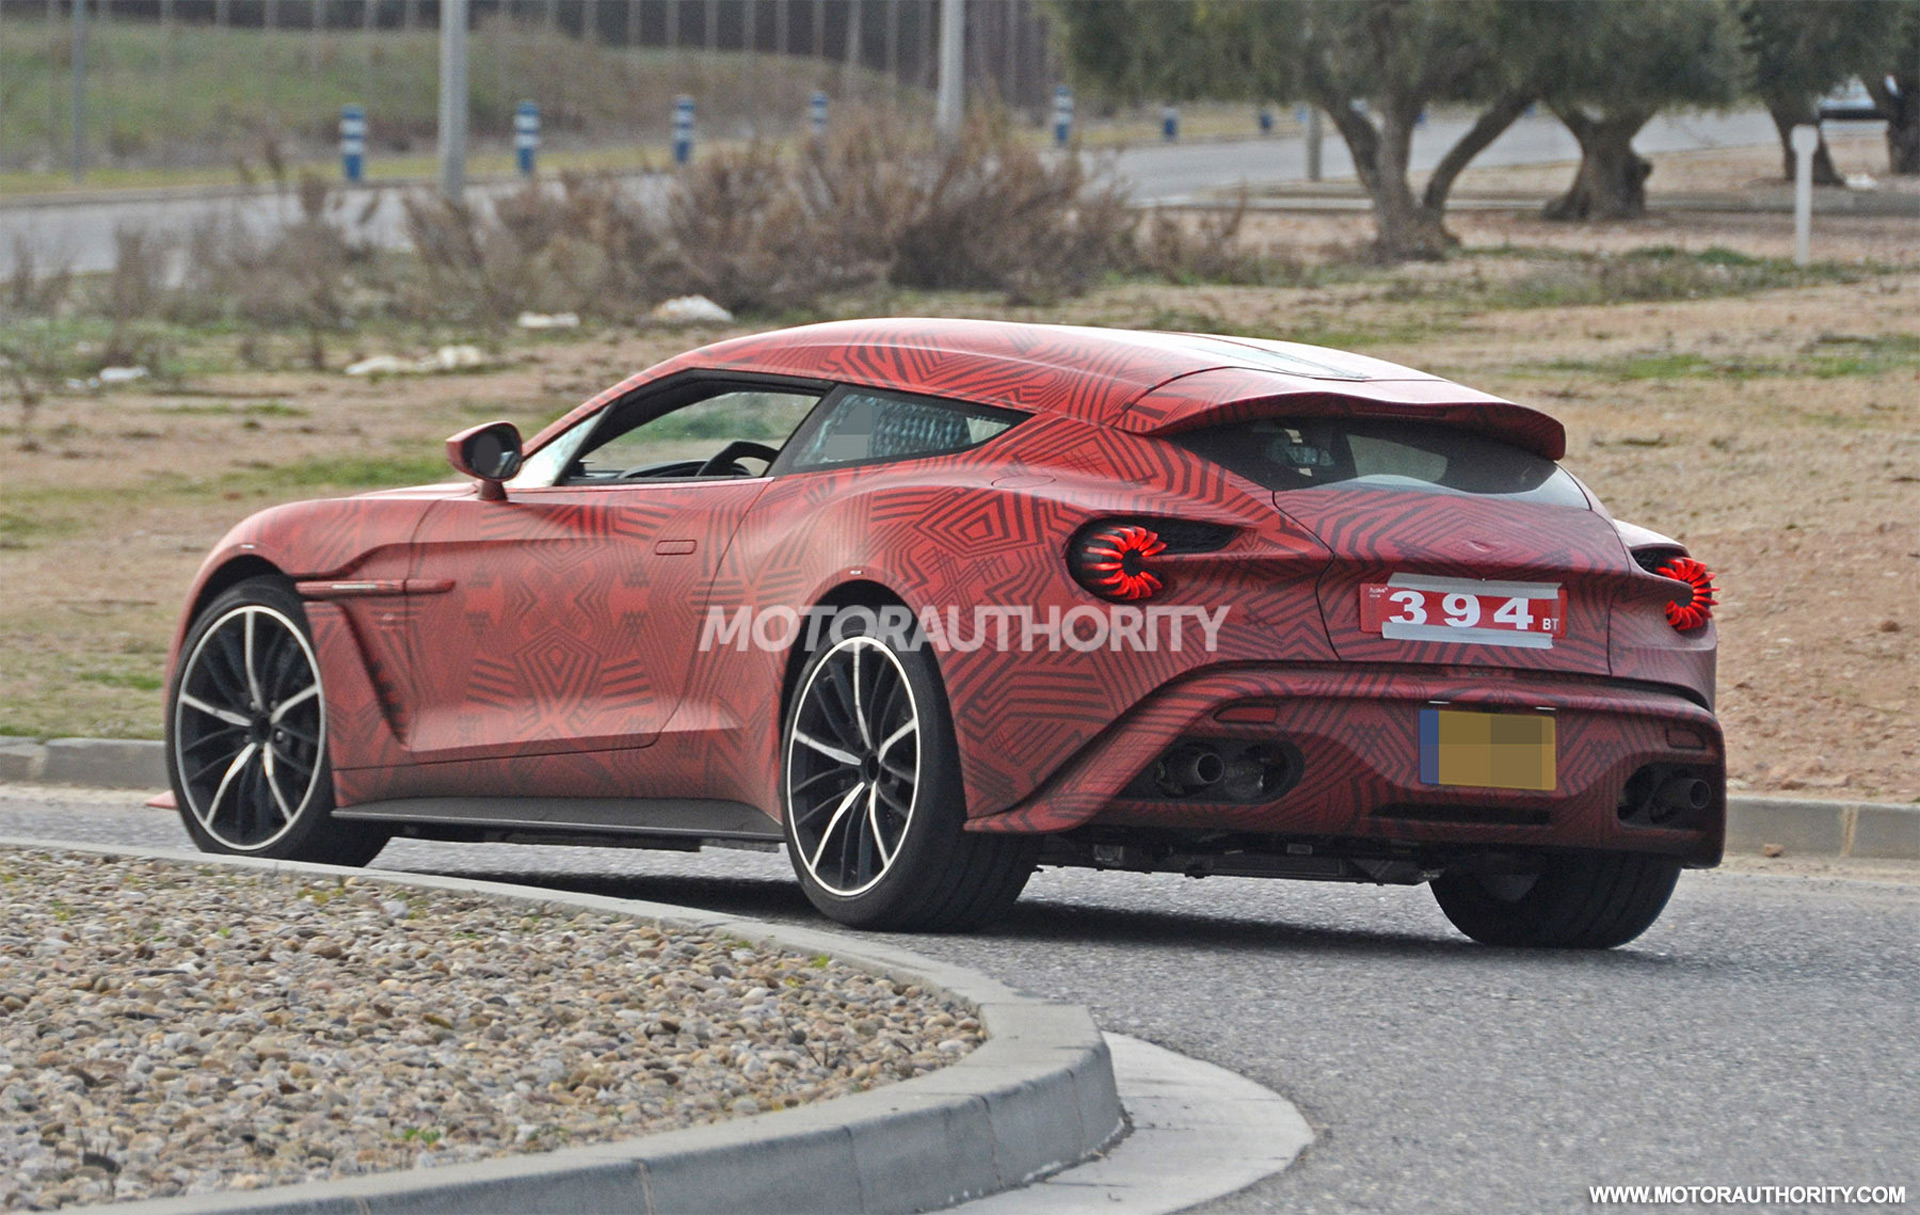 2012 - [Aston Martin] Vanquish [310] - Page 11 Aston-martin-vanquish-zagato-shooting-brake-spy-shots--image-via-s-baldauf-sb-medien_100684630_h